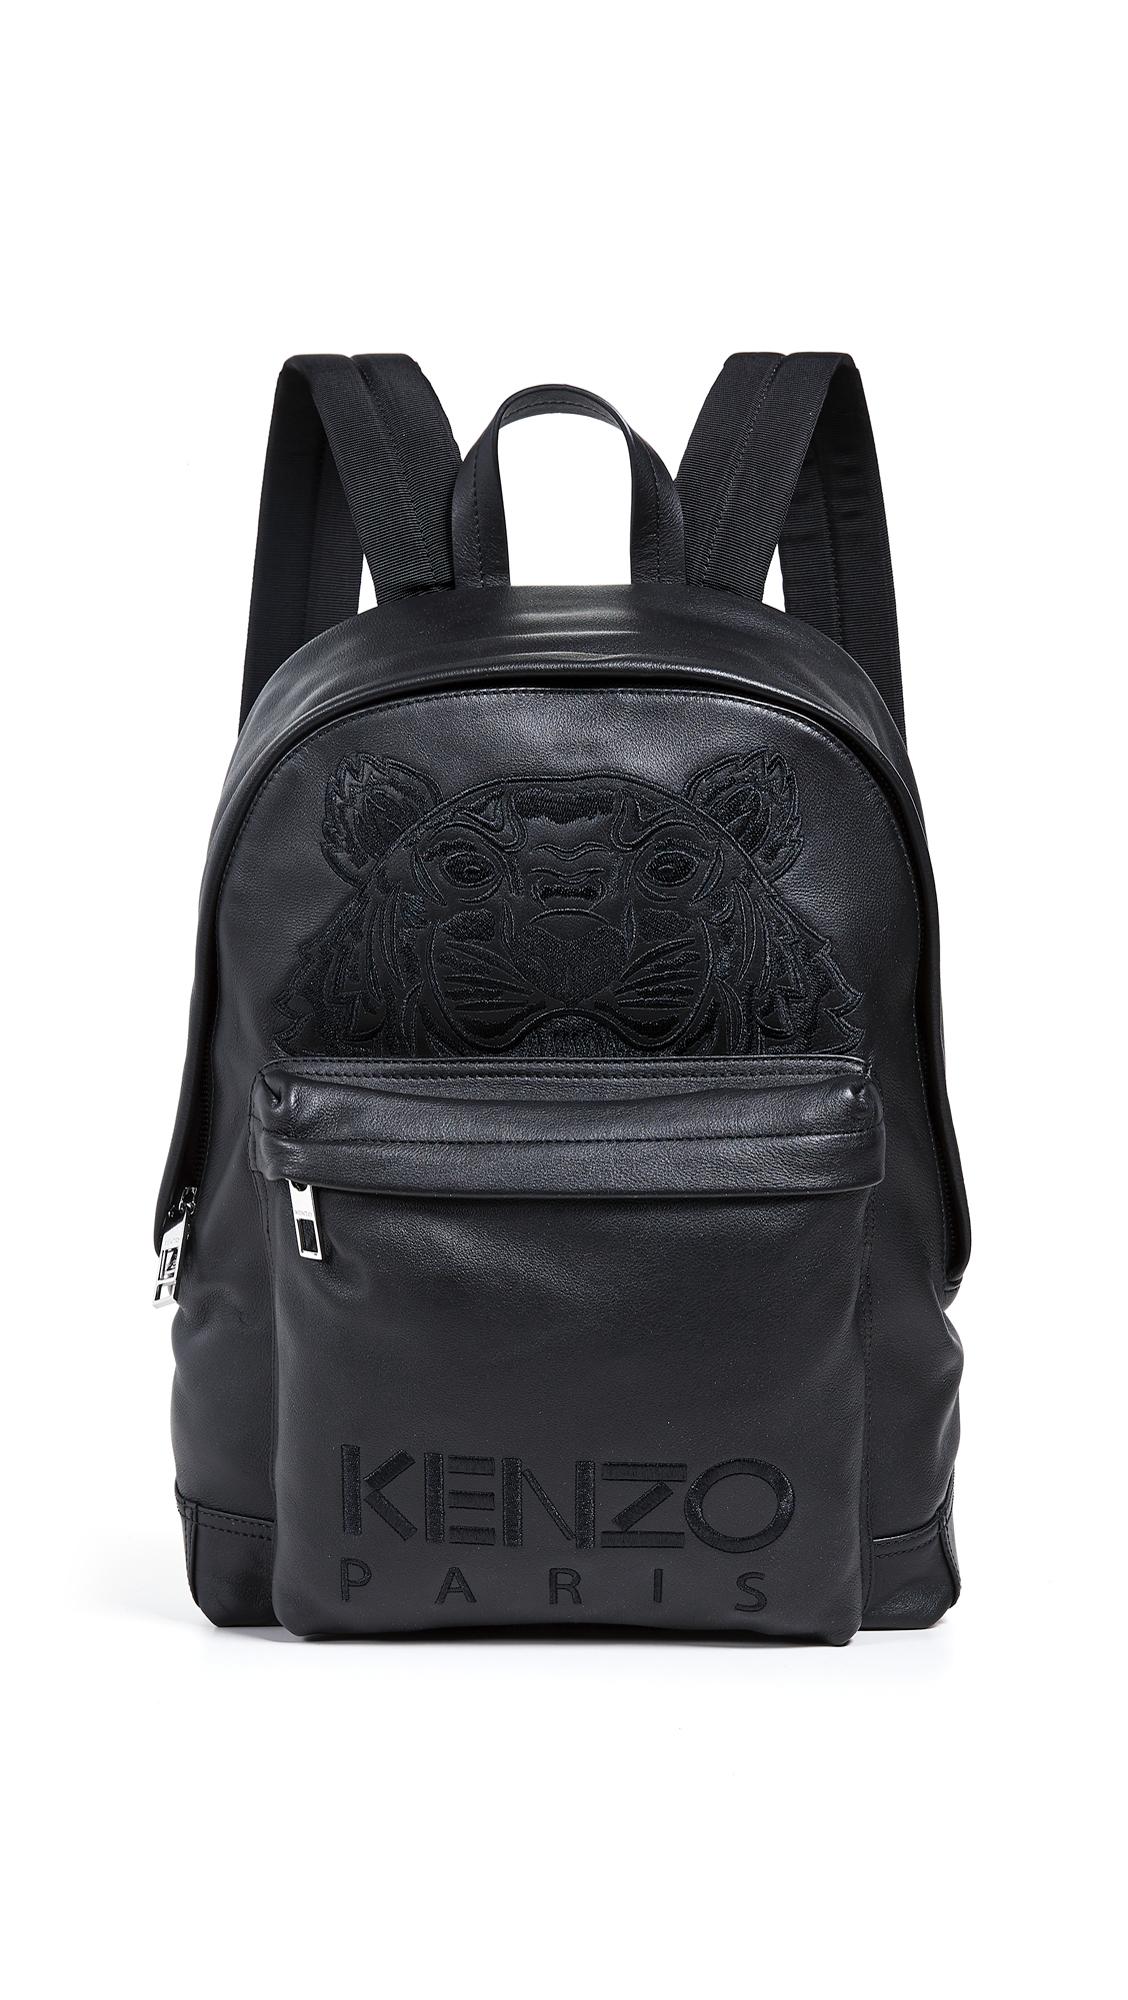 KENZO Iconic Rucksack - Black